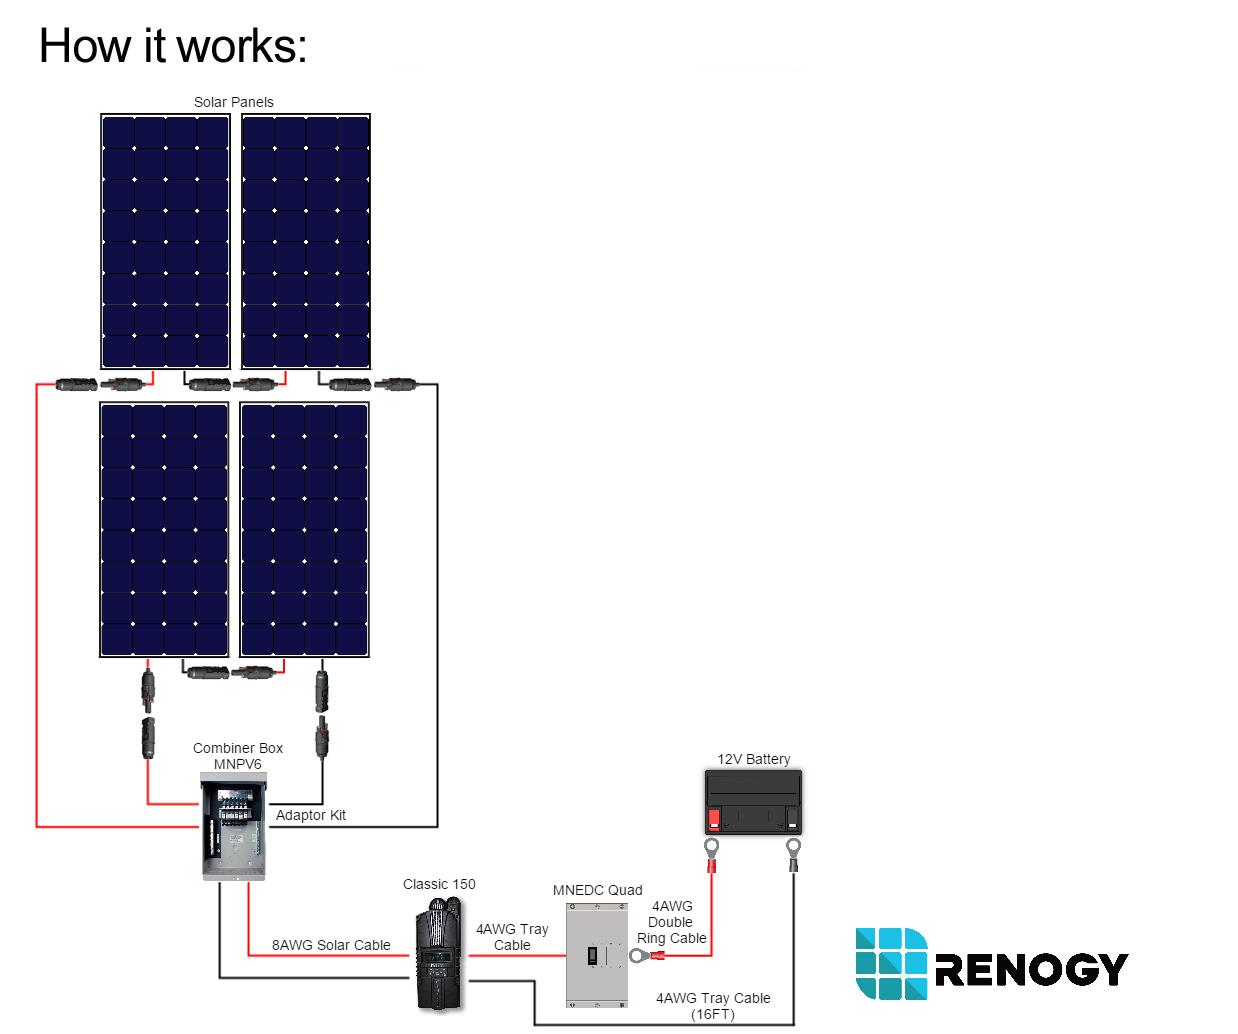 wiring diagram 12 volt solar system el thermo fan renogy 21 images